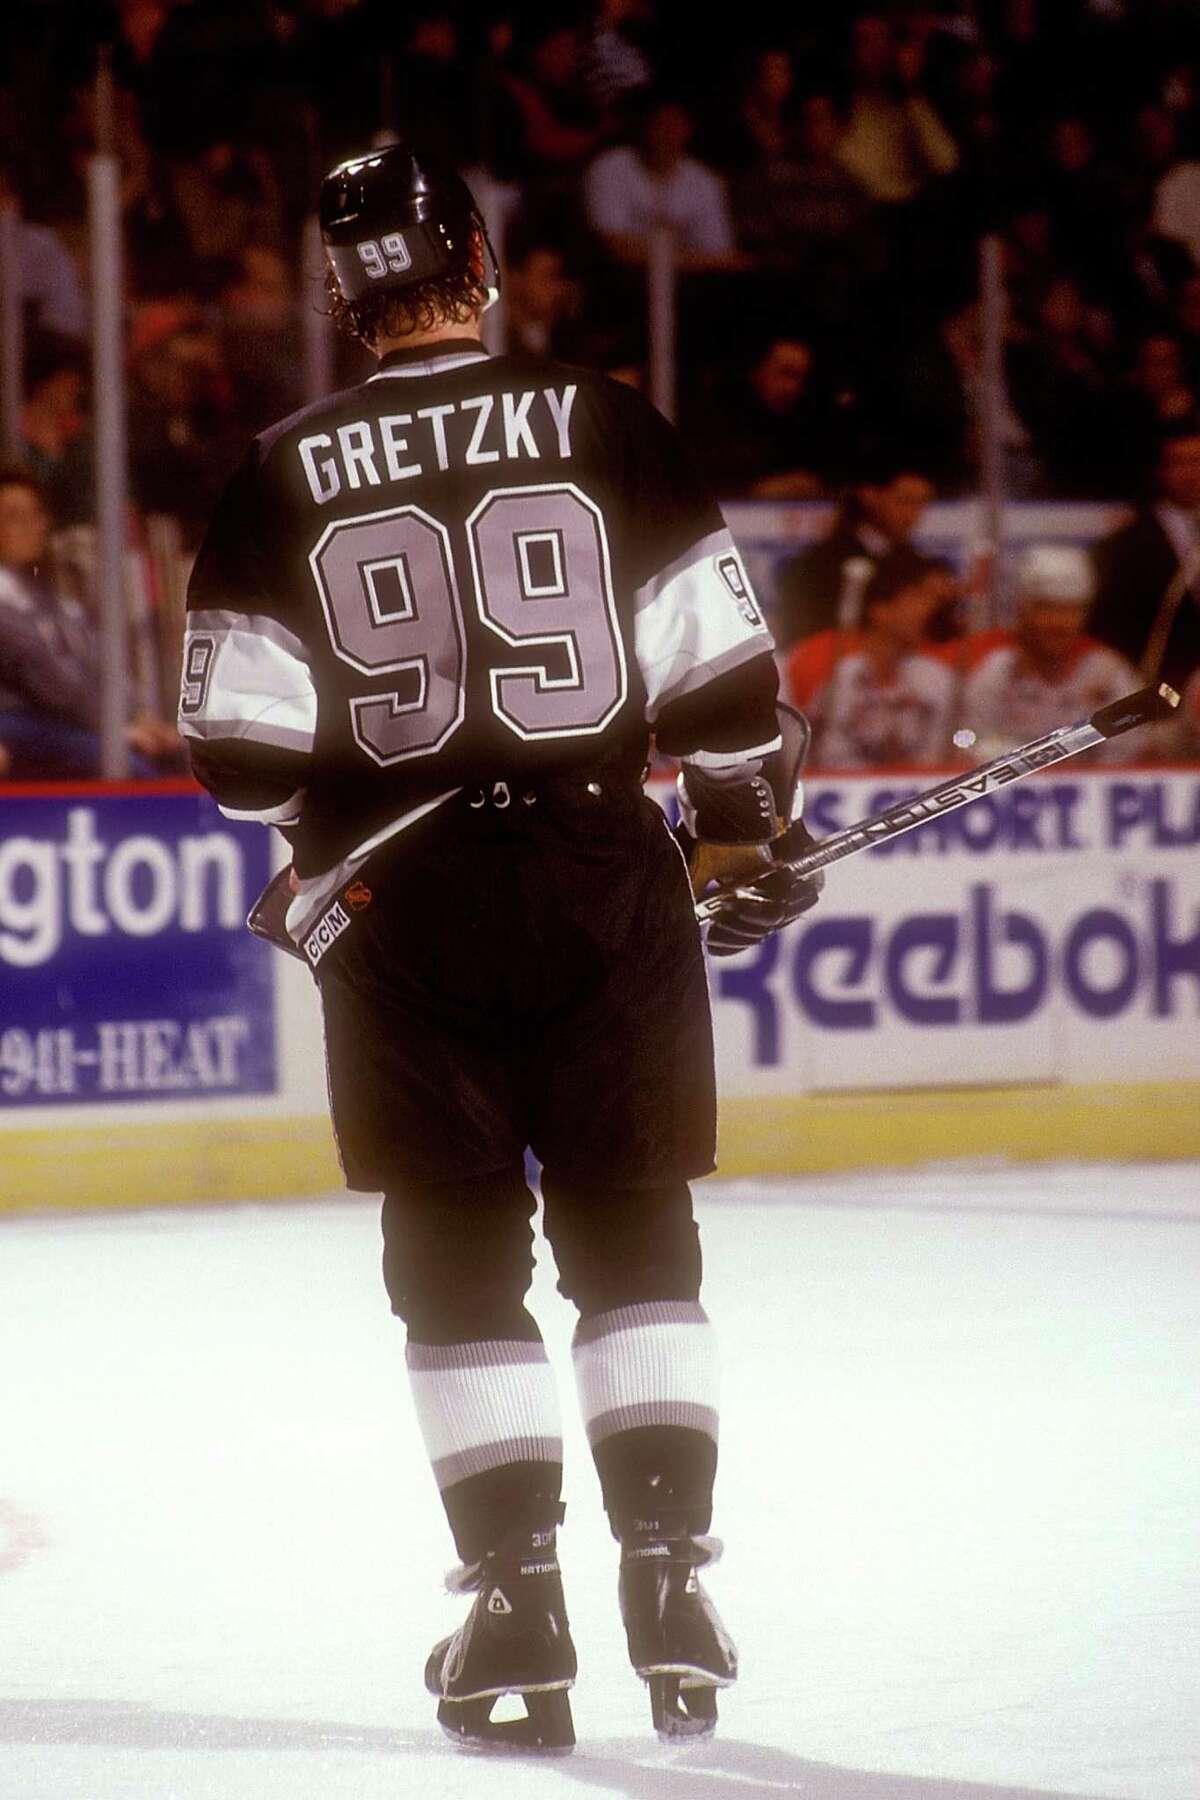 Alaska : Wayne Gretzky Los Angeles Kinds 1992-93 Authentic Jersey Source:Mitchell & Ness